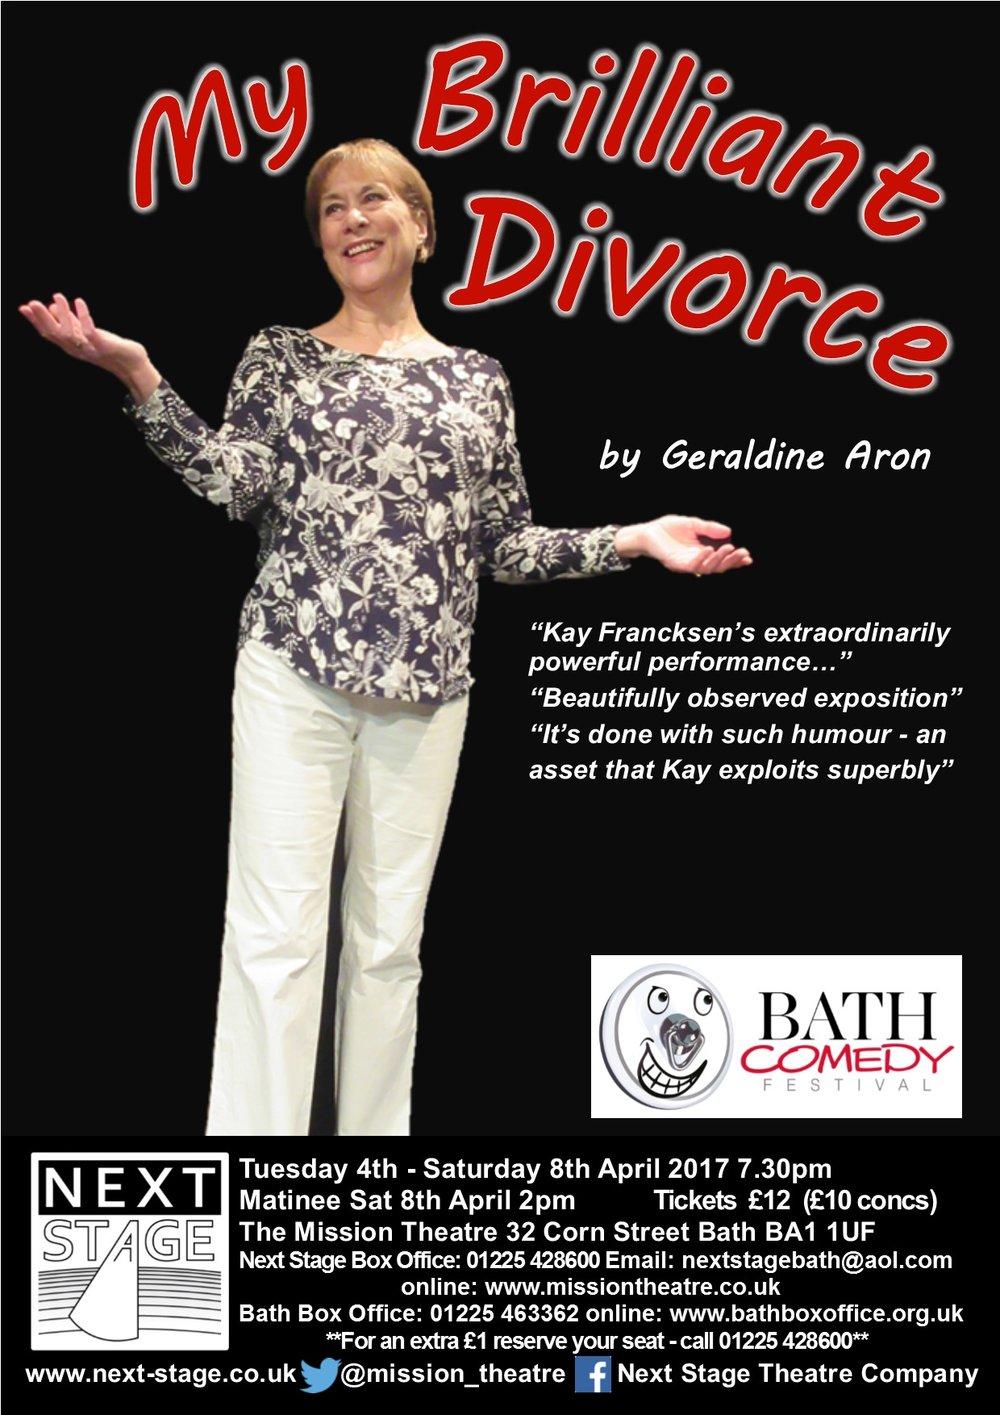 My Brilliant Divorce working poster (image).jpg